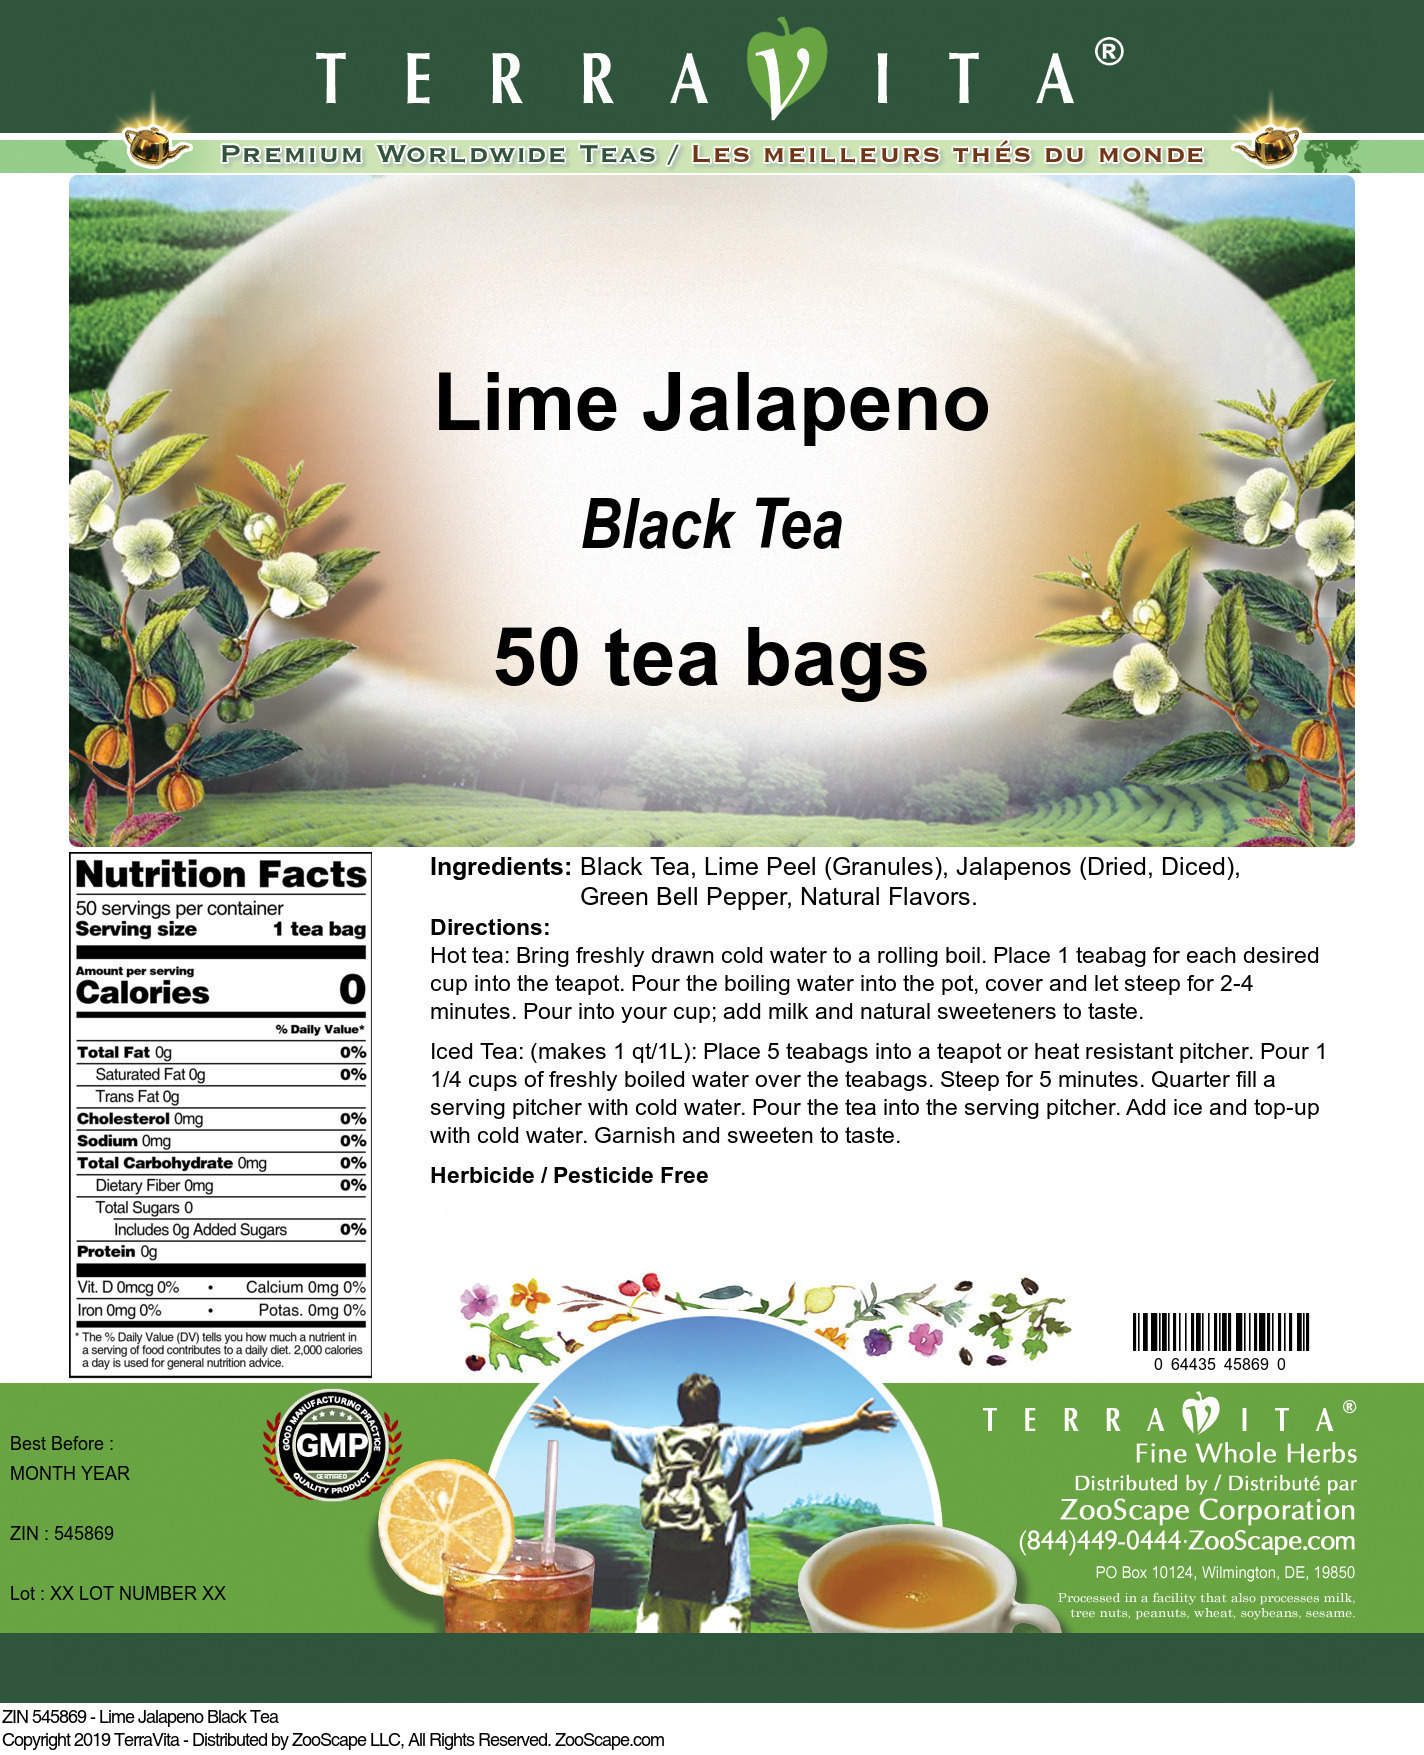 Lime Jalapeno Black Tea